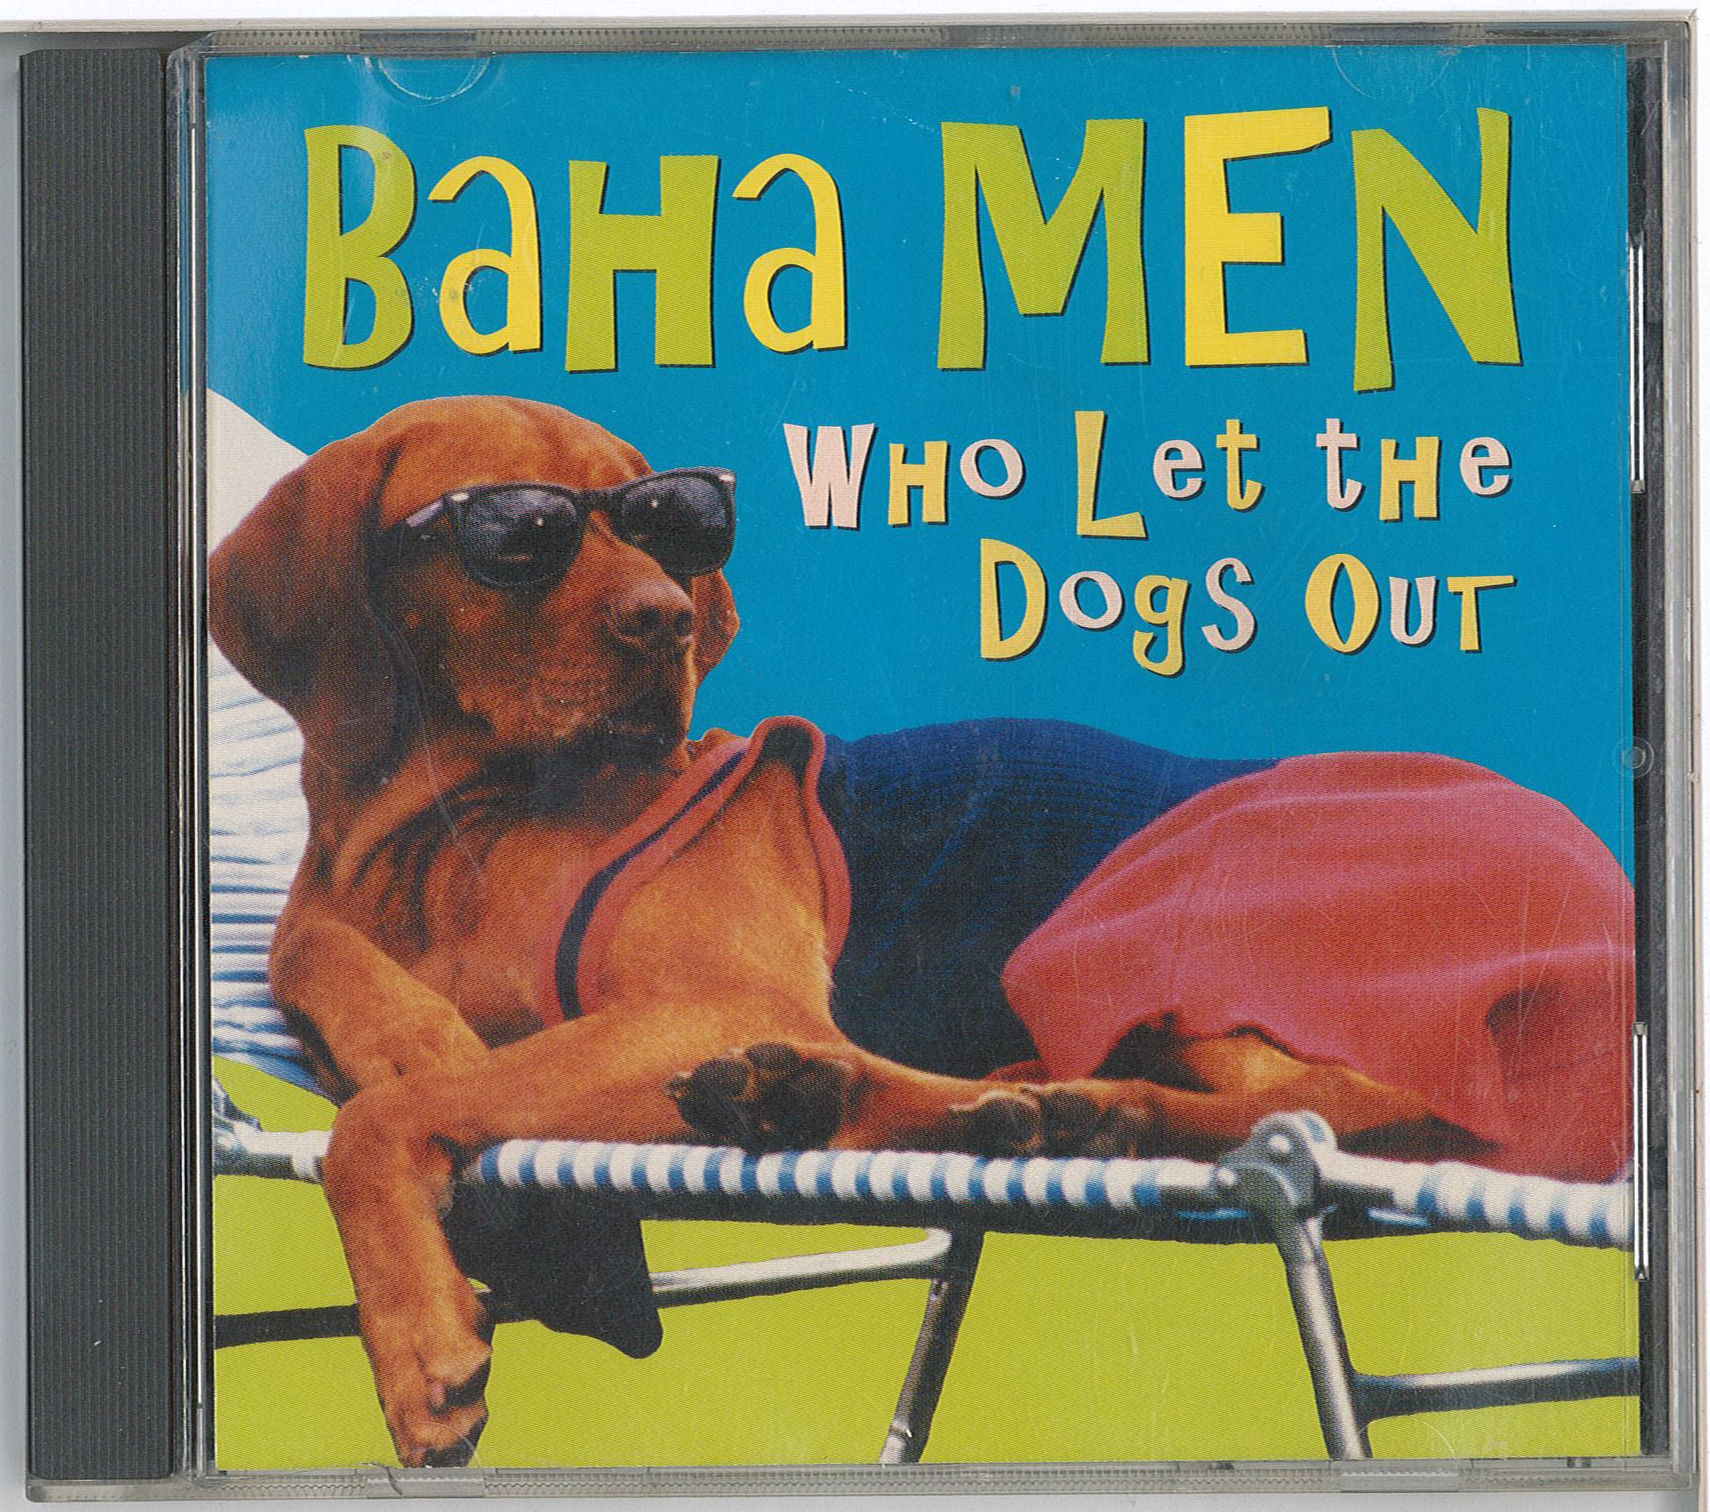 WLWLTDOO-2000-CD-BAHA-MEN-WLTDO-SINGLE-FRONT.jpg